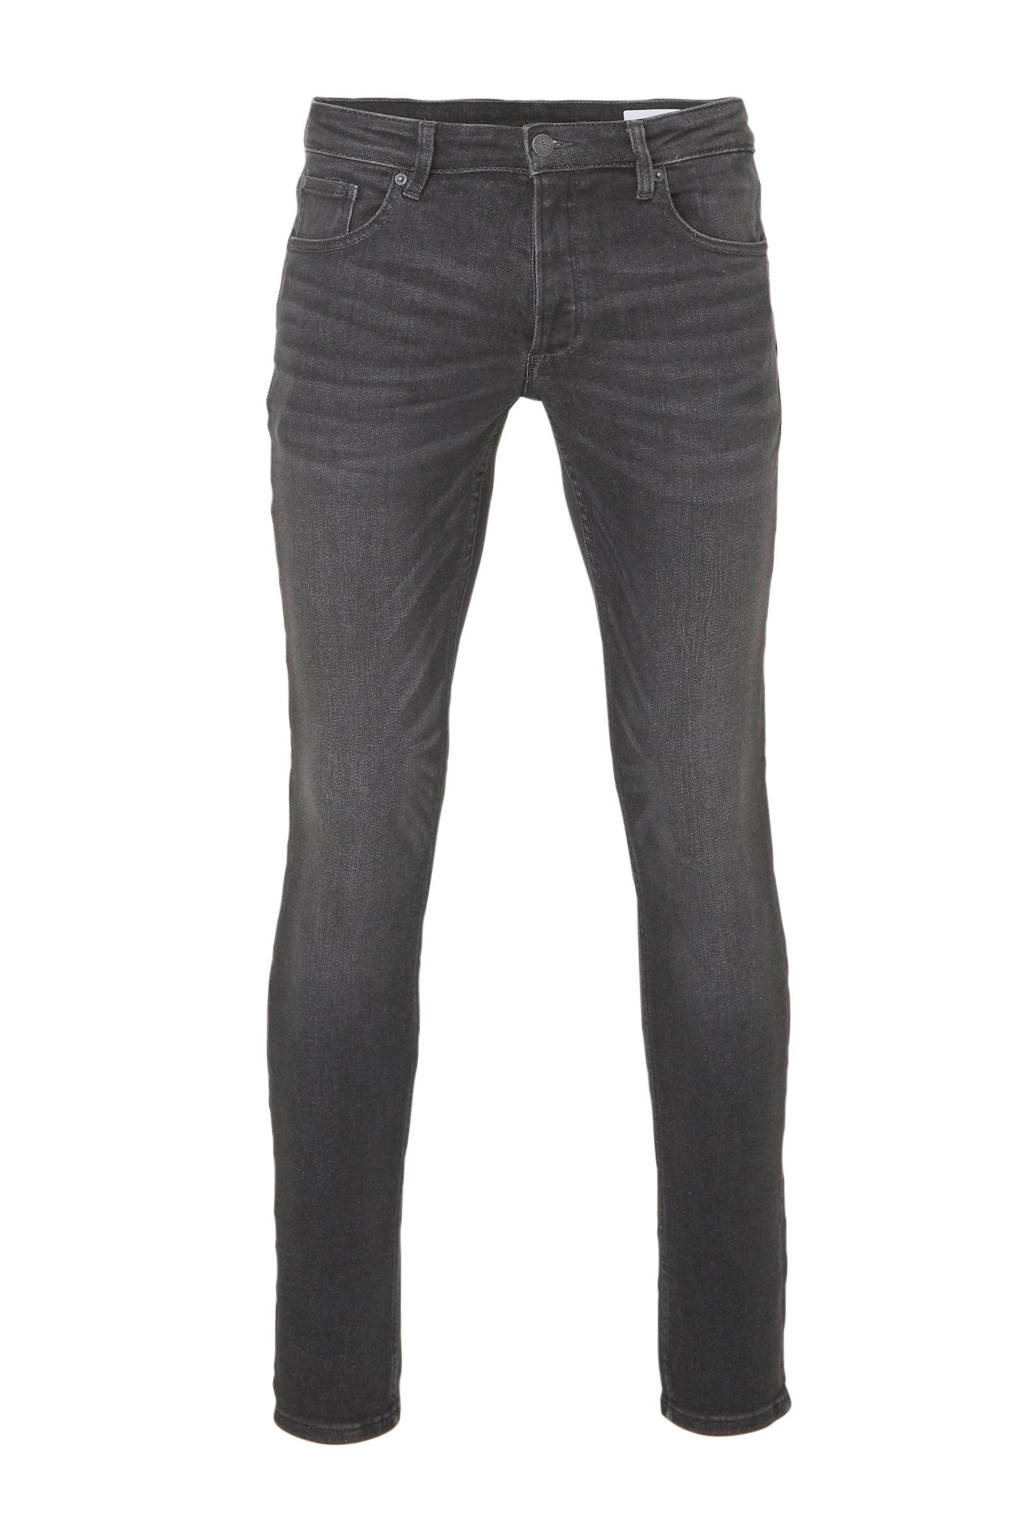 WE Fashion Blue Ridge slim fit jeans, Black denim